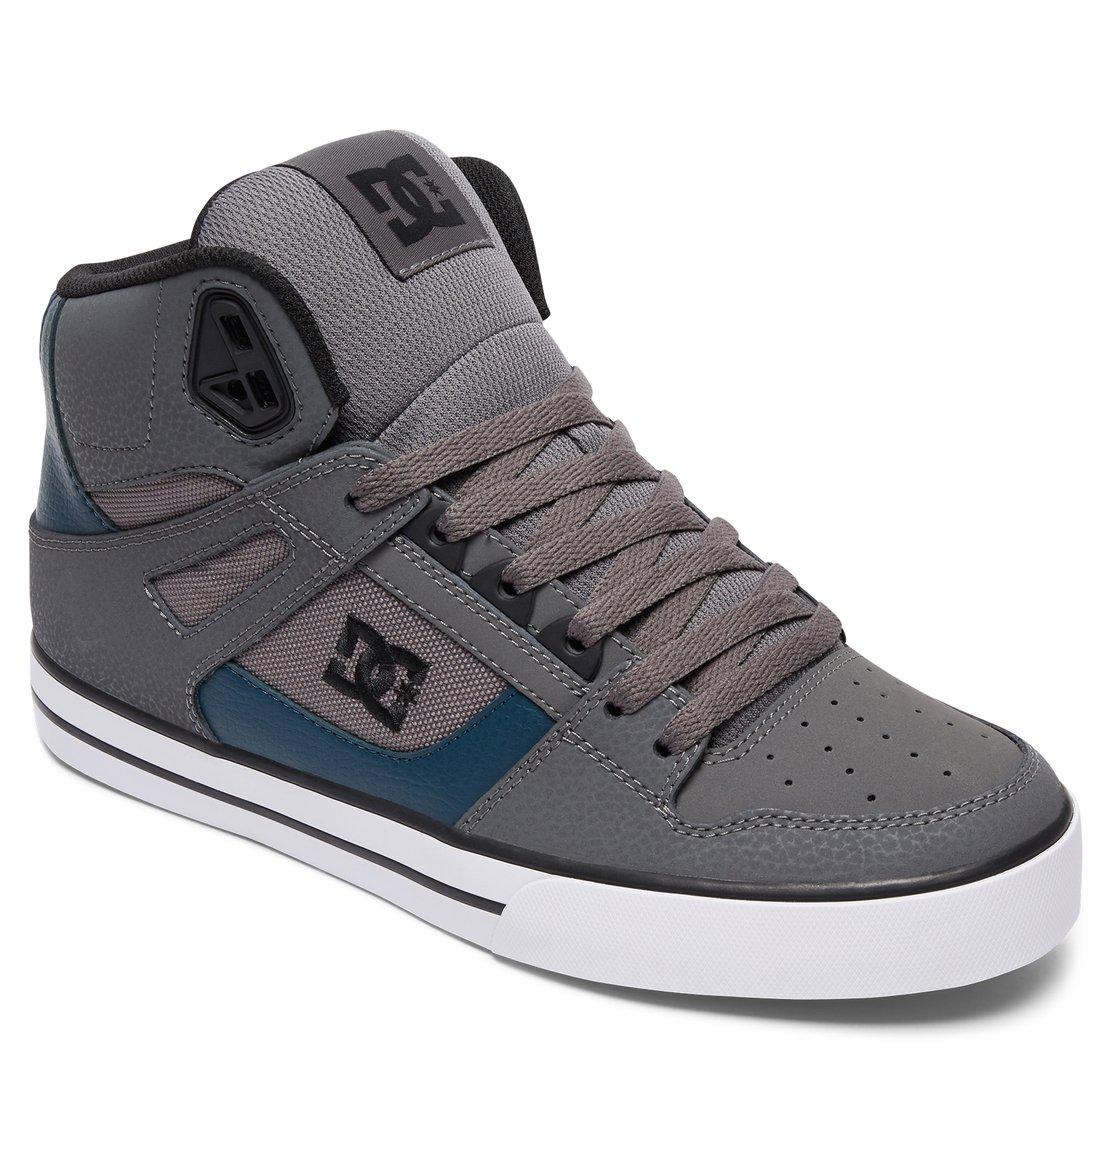 DC Shoes Men's Spartan High WC Hi Top Shoes Black Black (XKKK) 9.5 NmG19zG